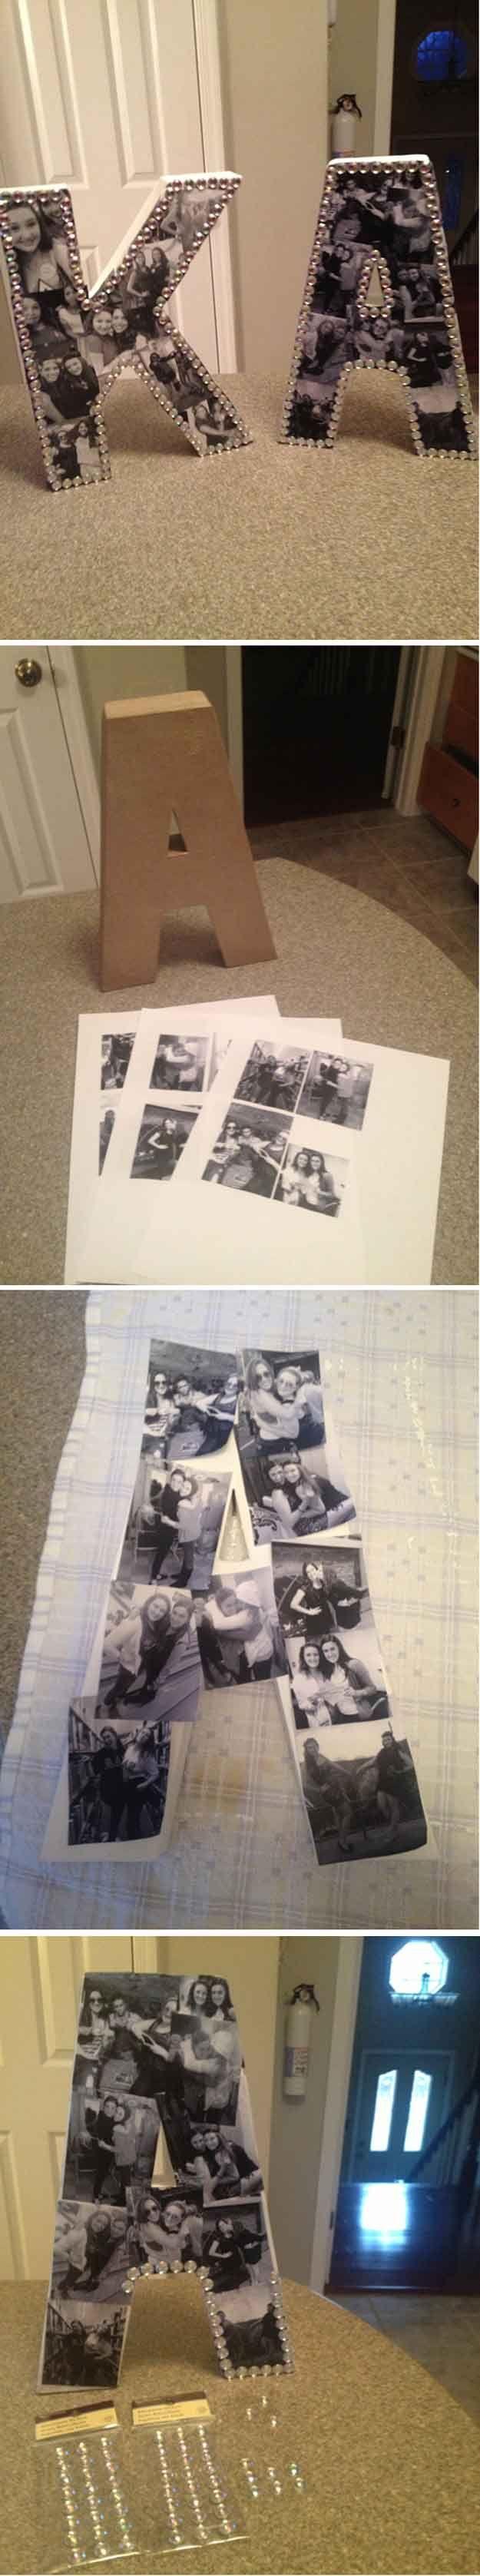 Cool DIY Photo Decor Ideas for Teen